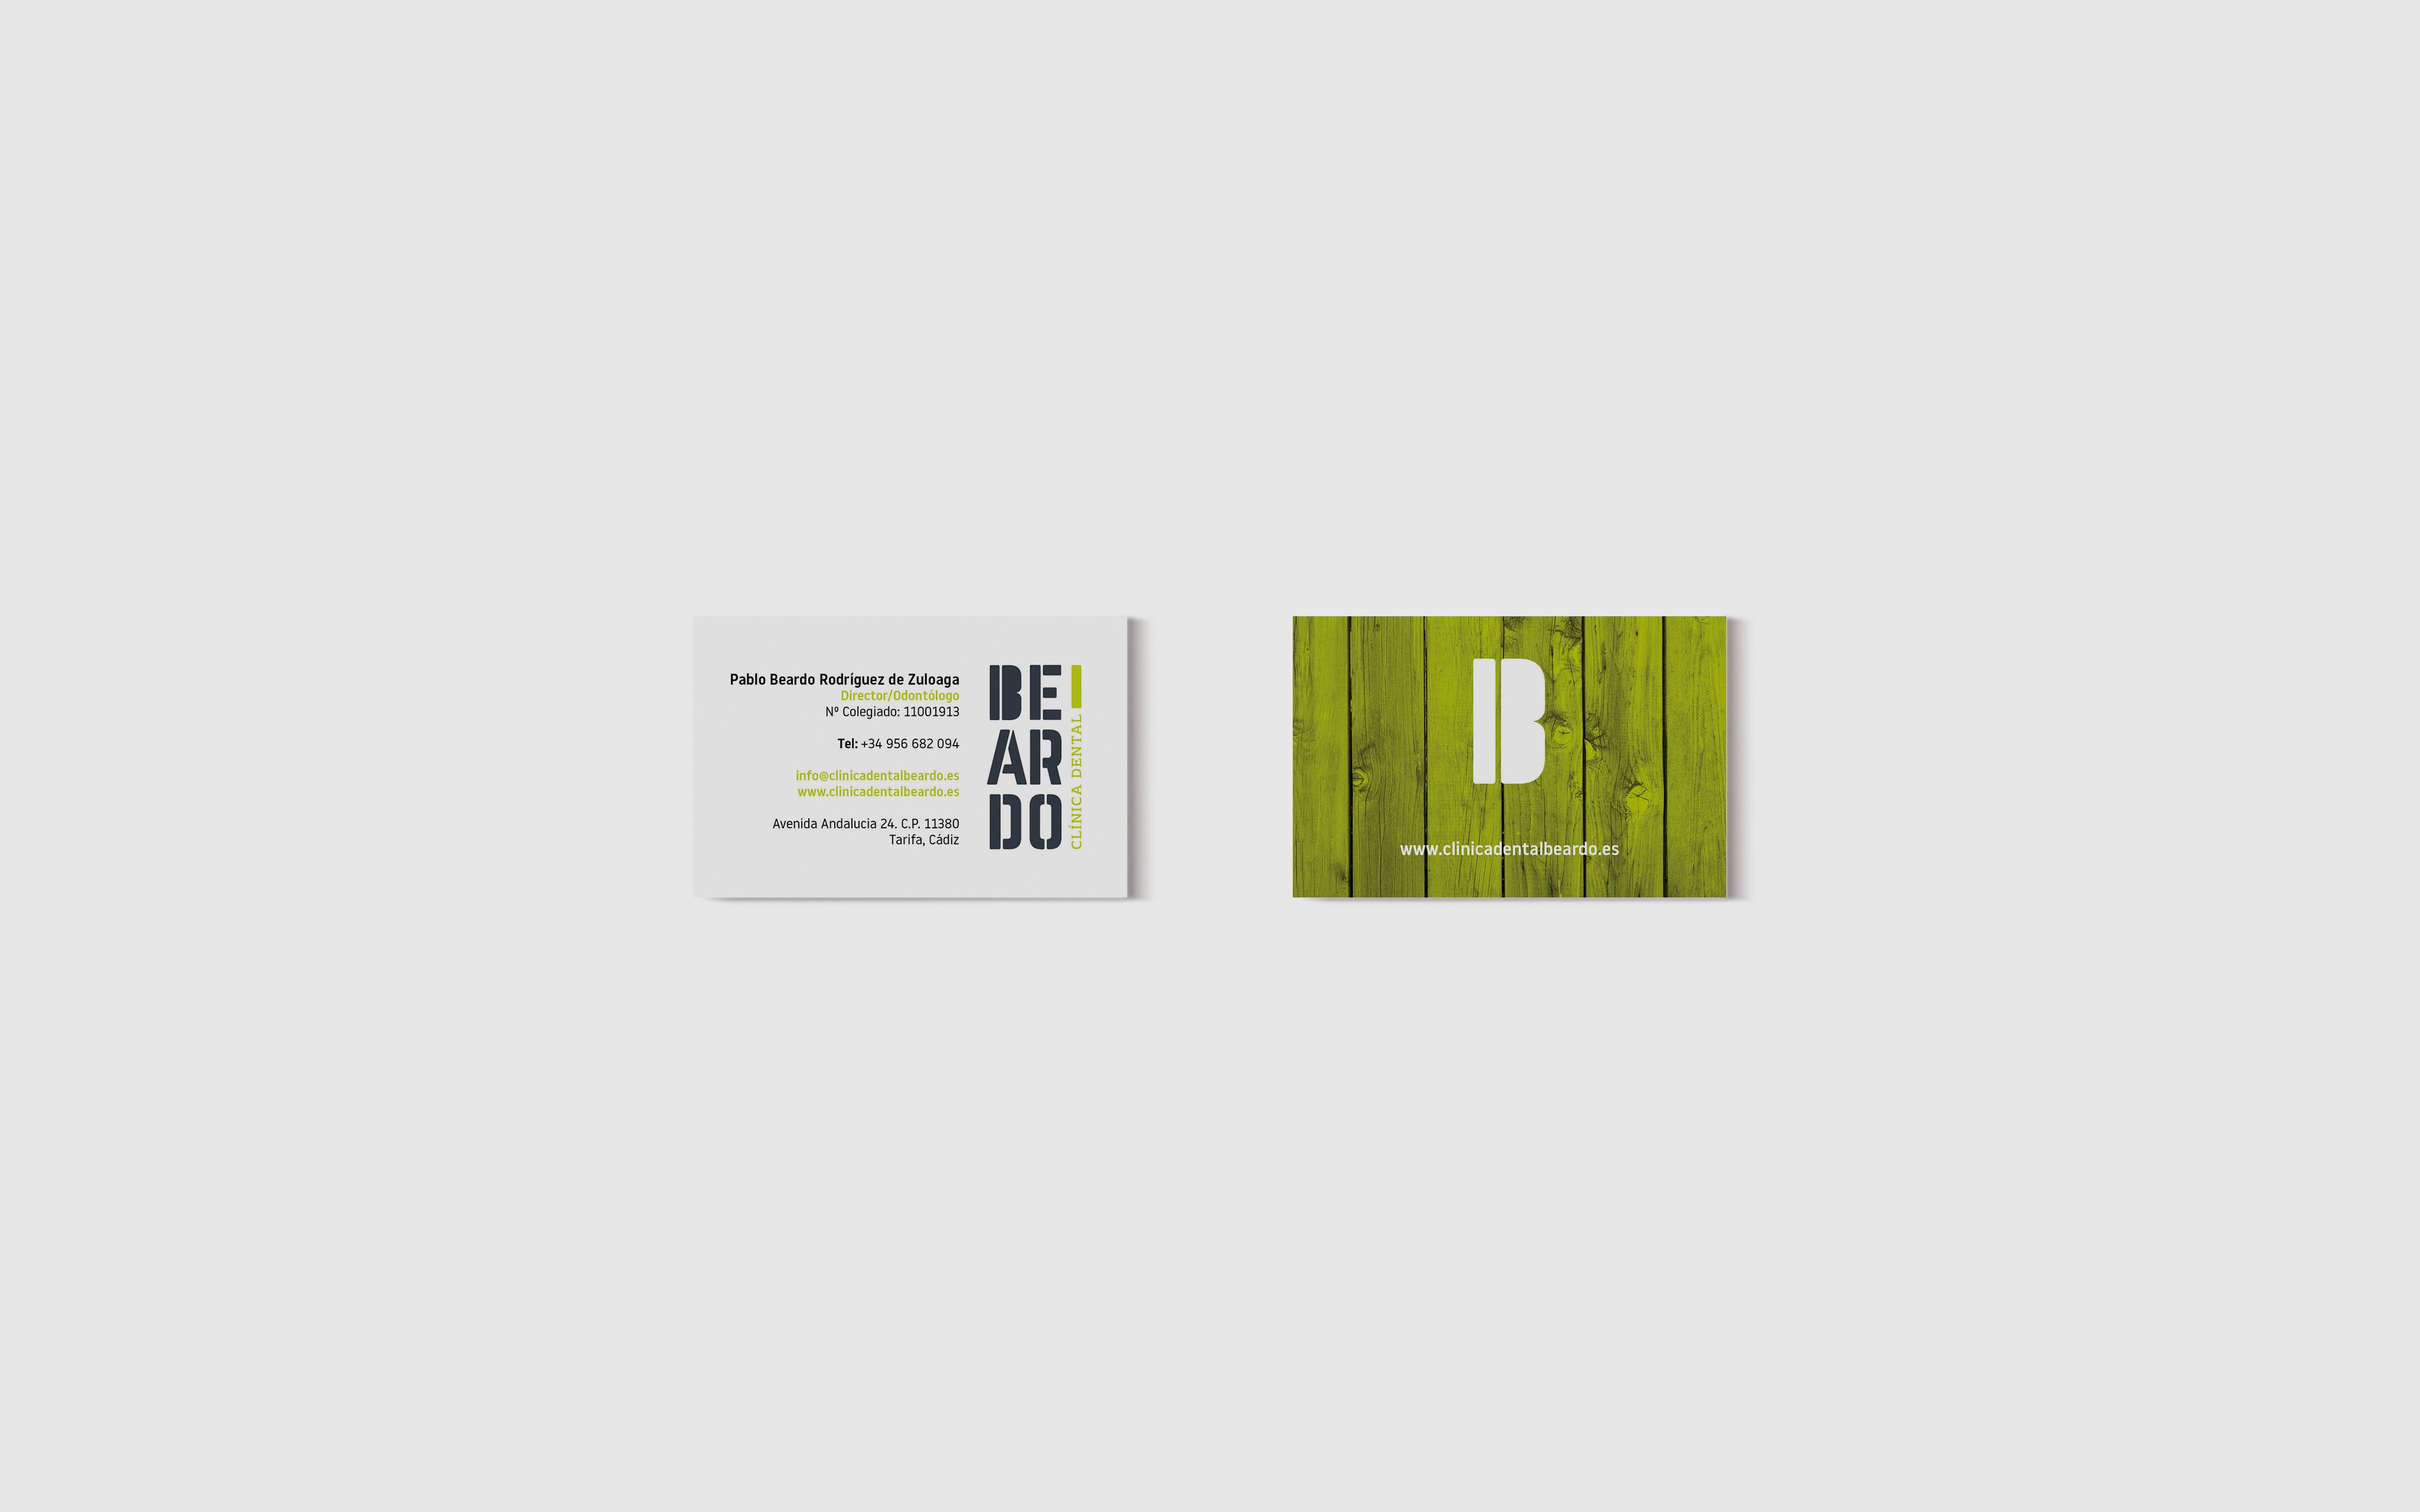 diseño-marca-tarifa-agencia-adhoc-3